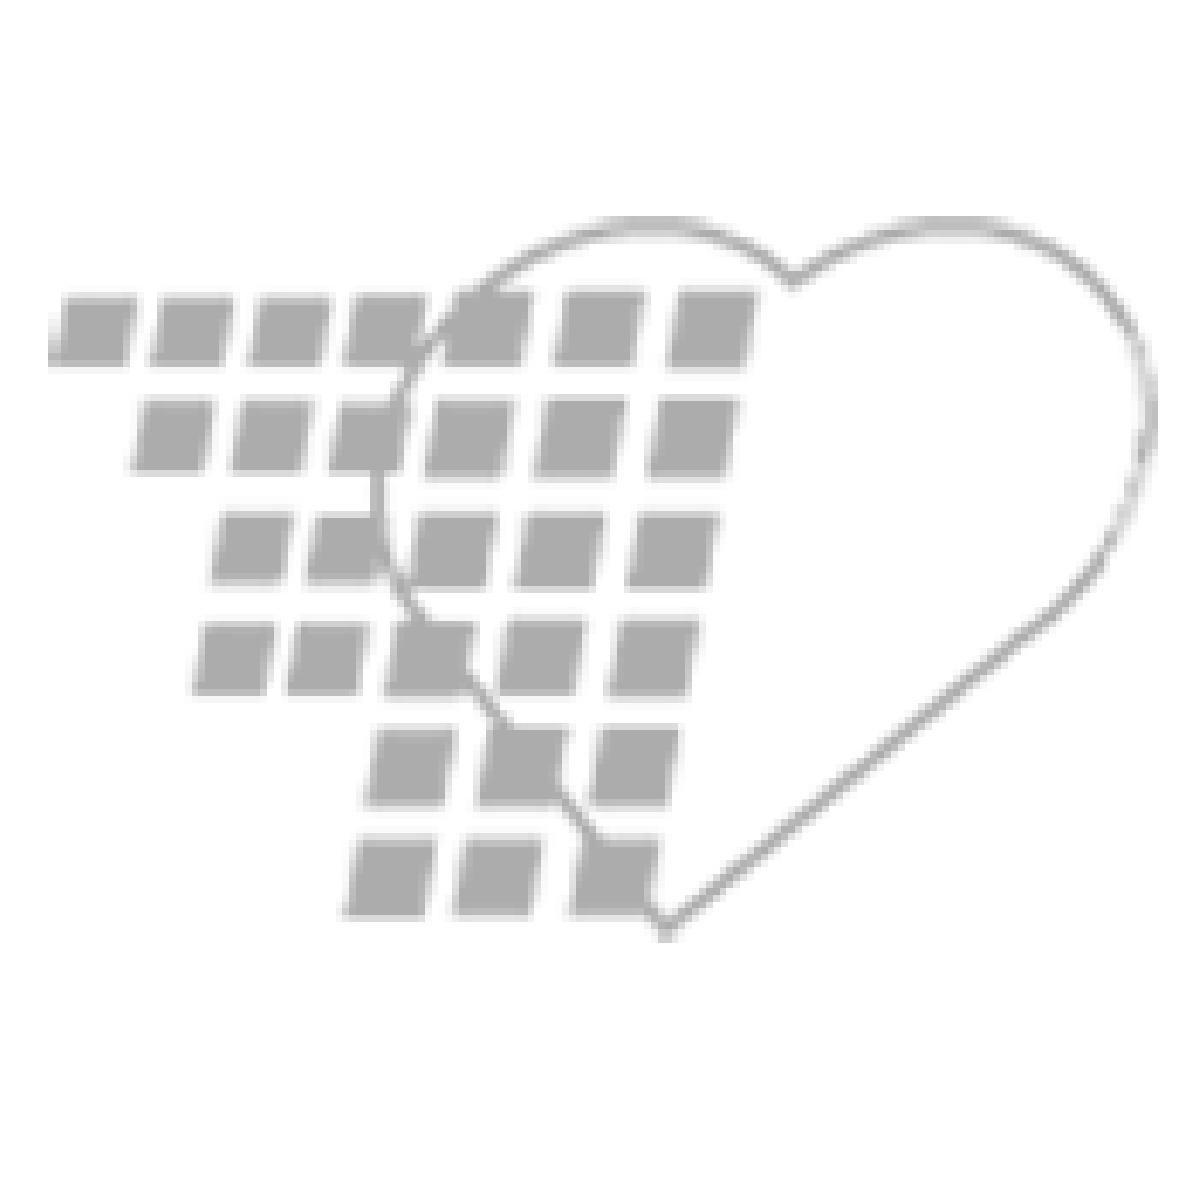 06-93-0040 - Demo Dose® Procn SR 250 mg - 100 Pills/Box